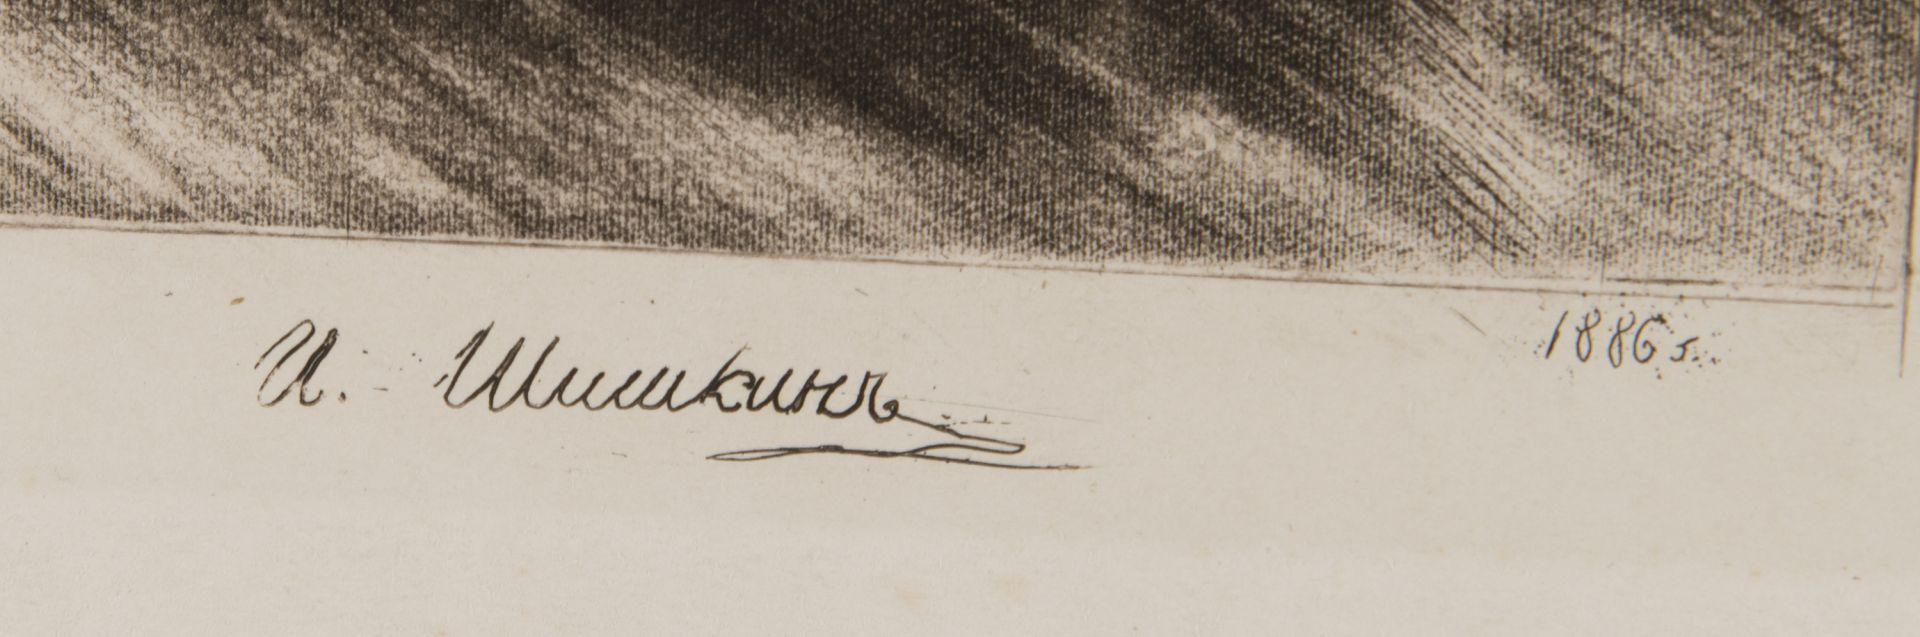 Ivan Ivanovitch SHISHKIN signature